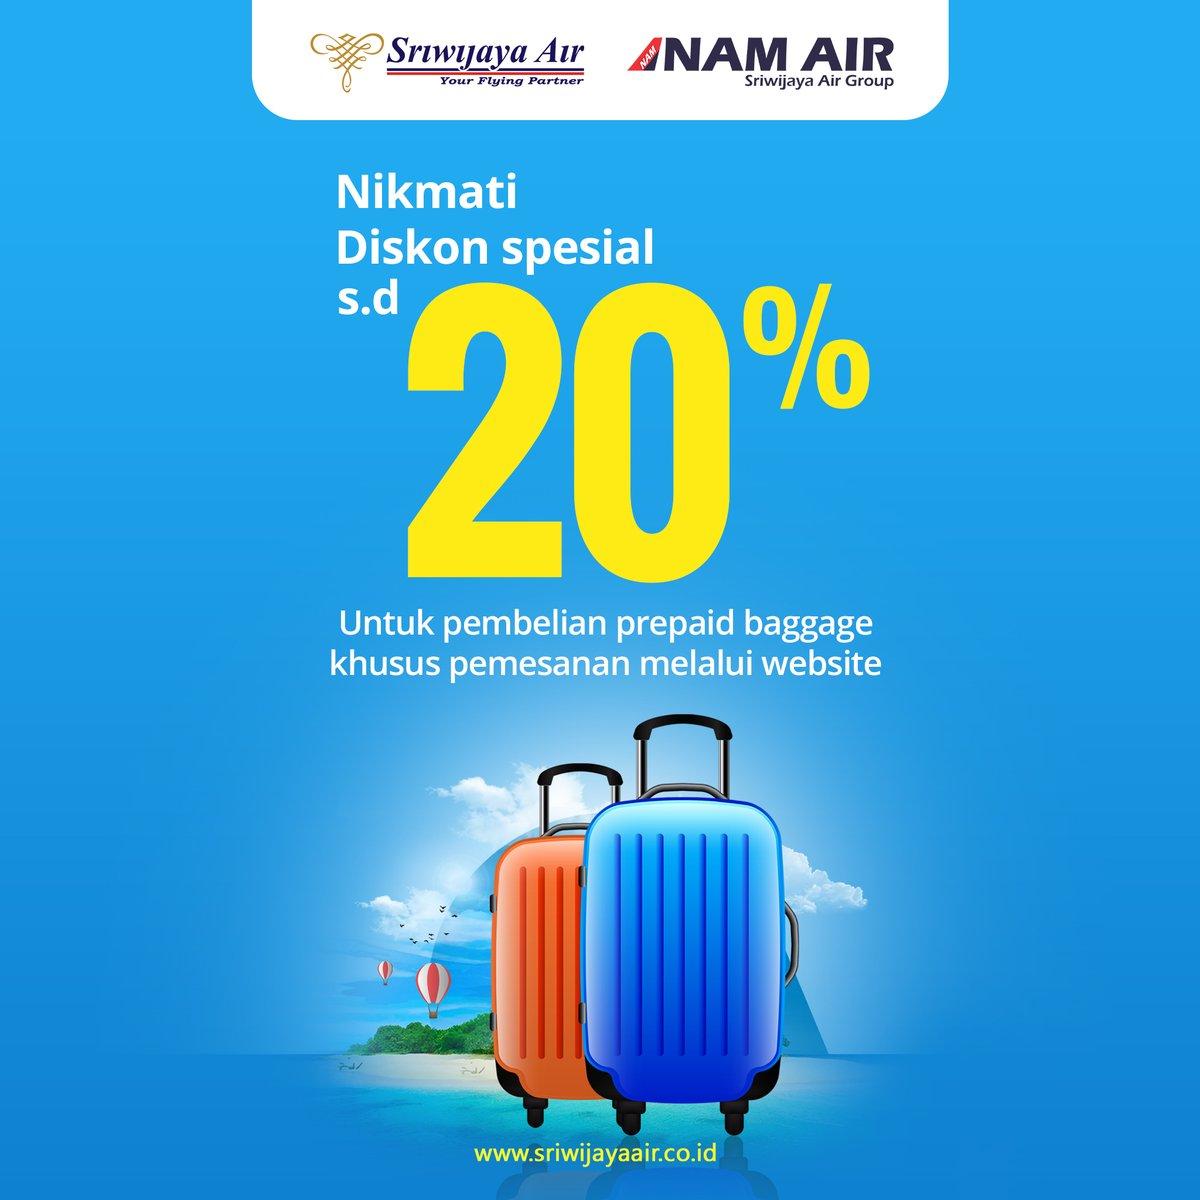 #SriwijayaAir - Promo Free Baggage Allowance & Diskon Spesial 20% Prepaid Baggage